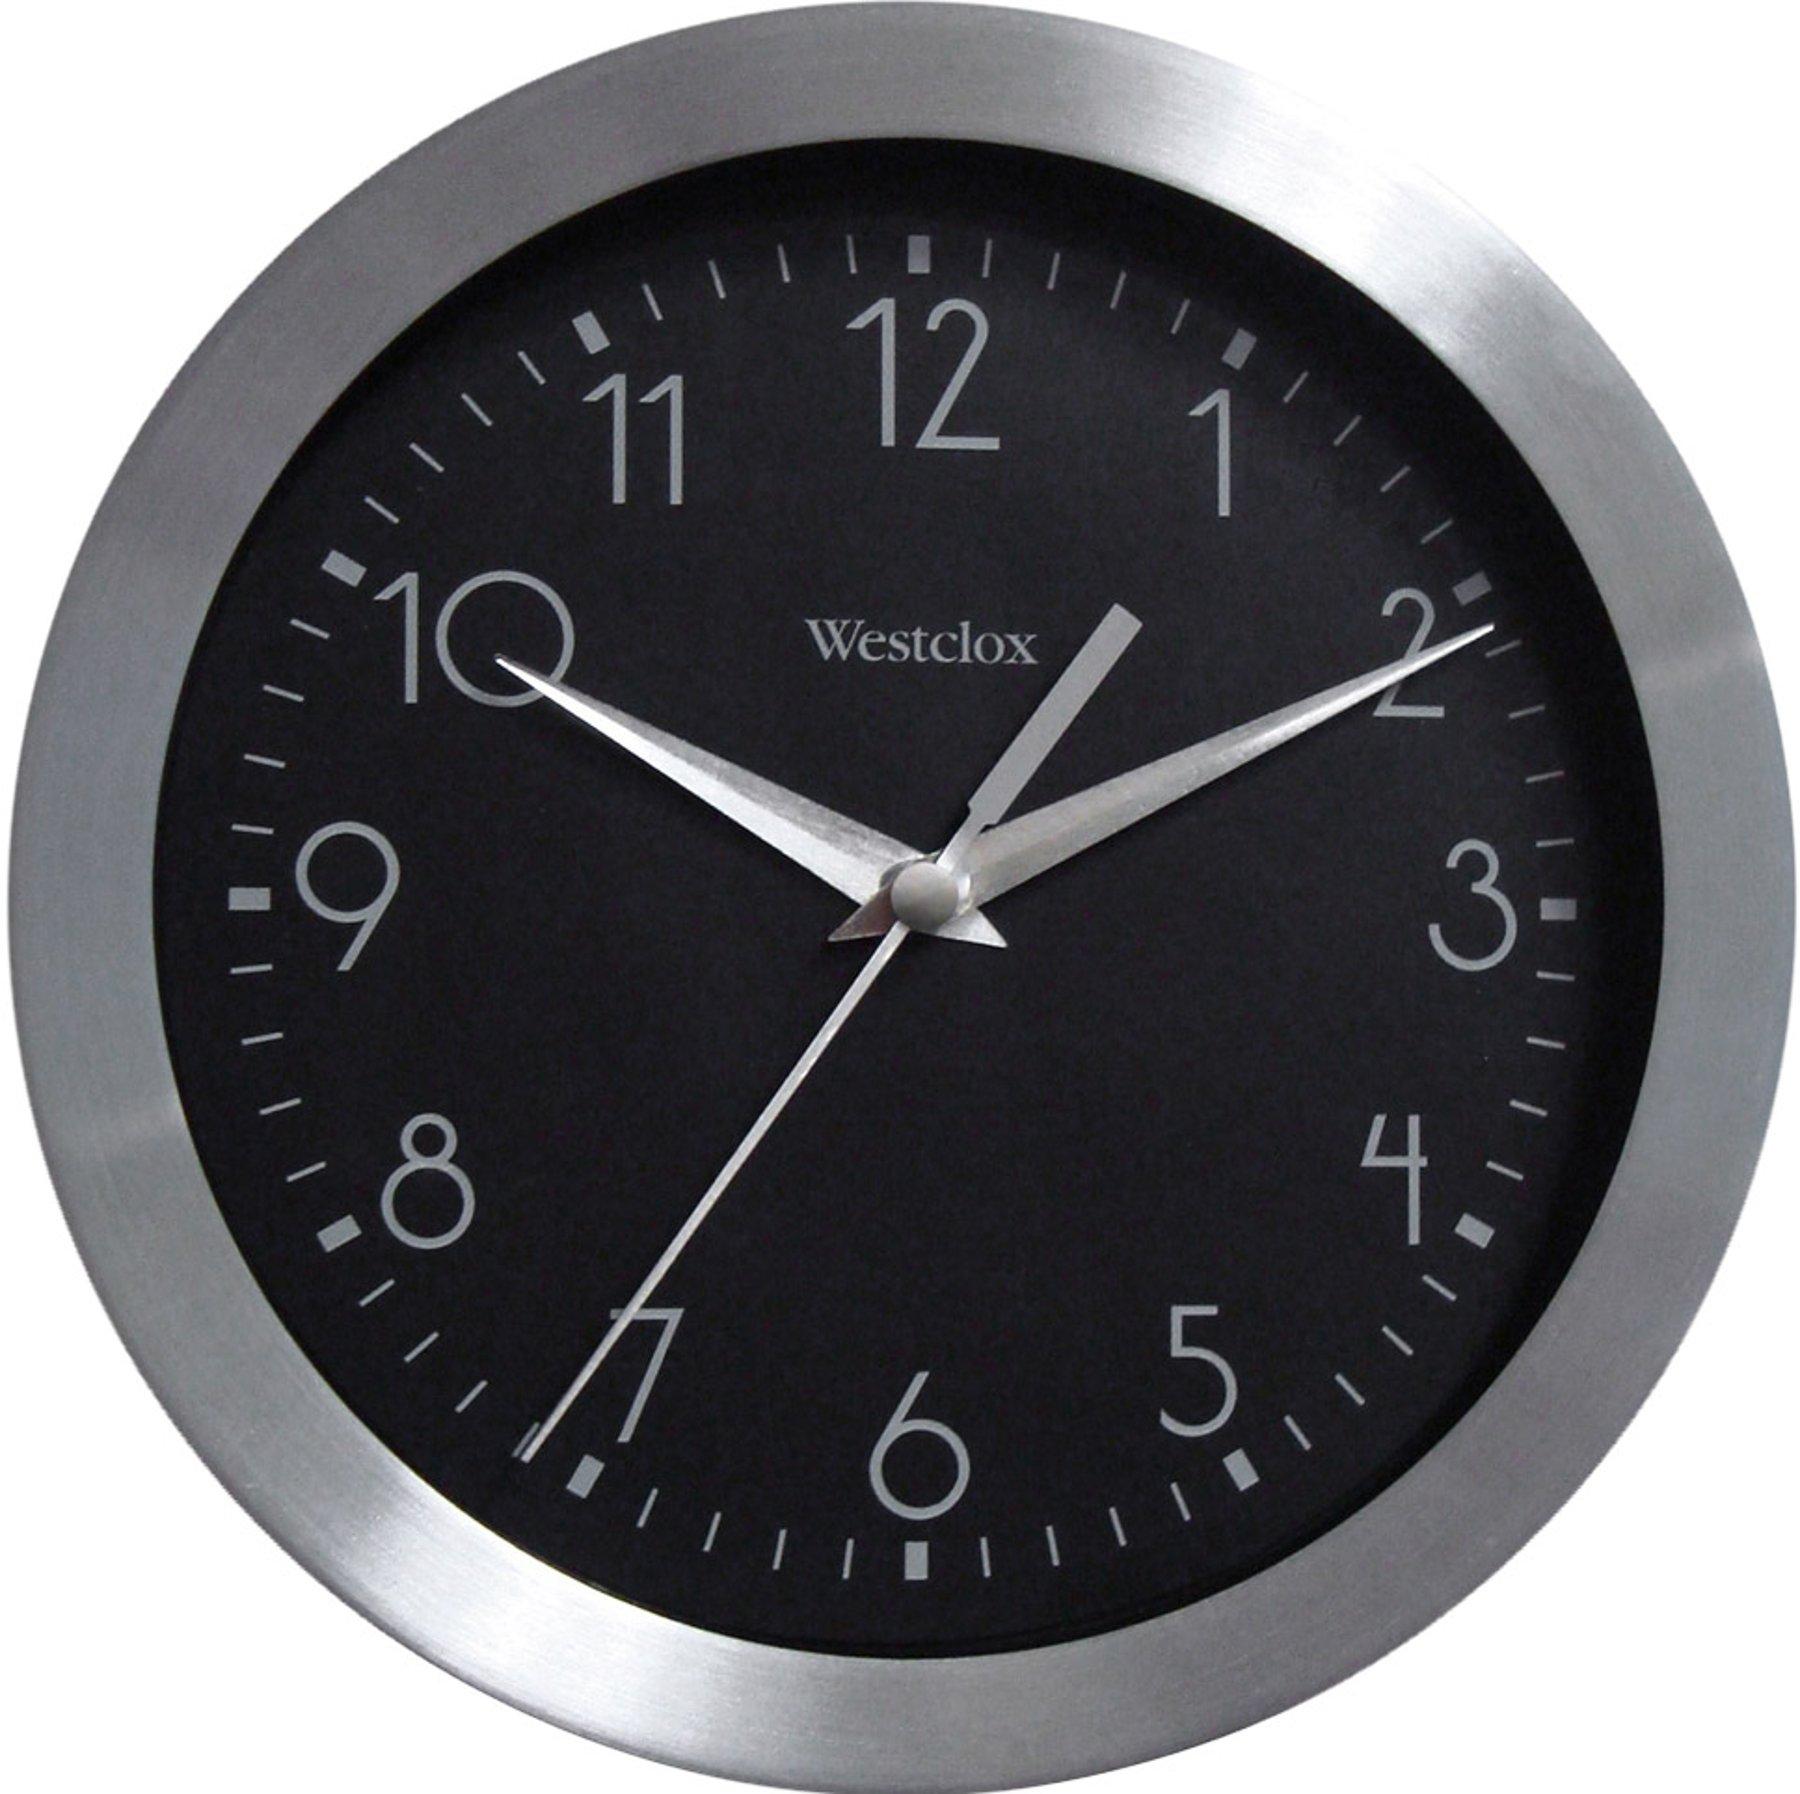 Westclox 36001A Metallic Silver 9 Inch Round Wall Clock